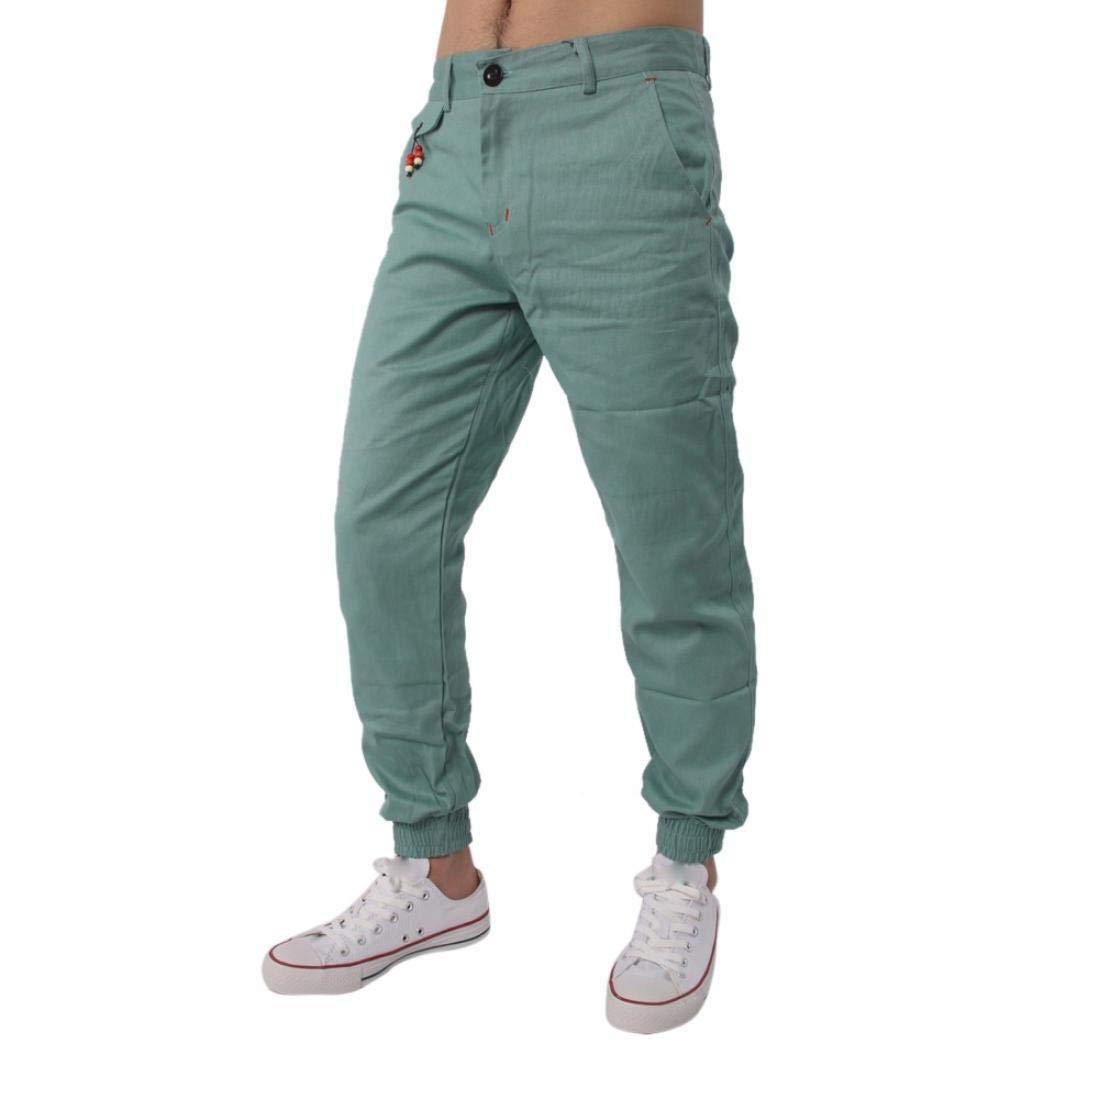 Realdo Clearance Casual Slack Solid Harem Sweatpants Loose Jogger Pant Sportwear Comfy for Men(Large,Green)